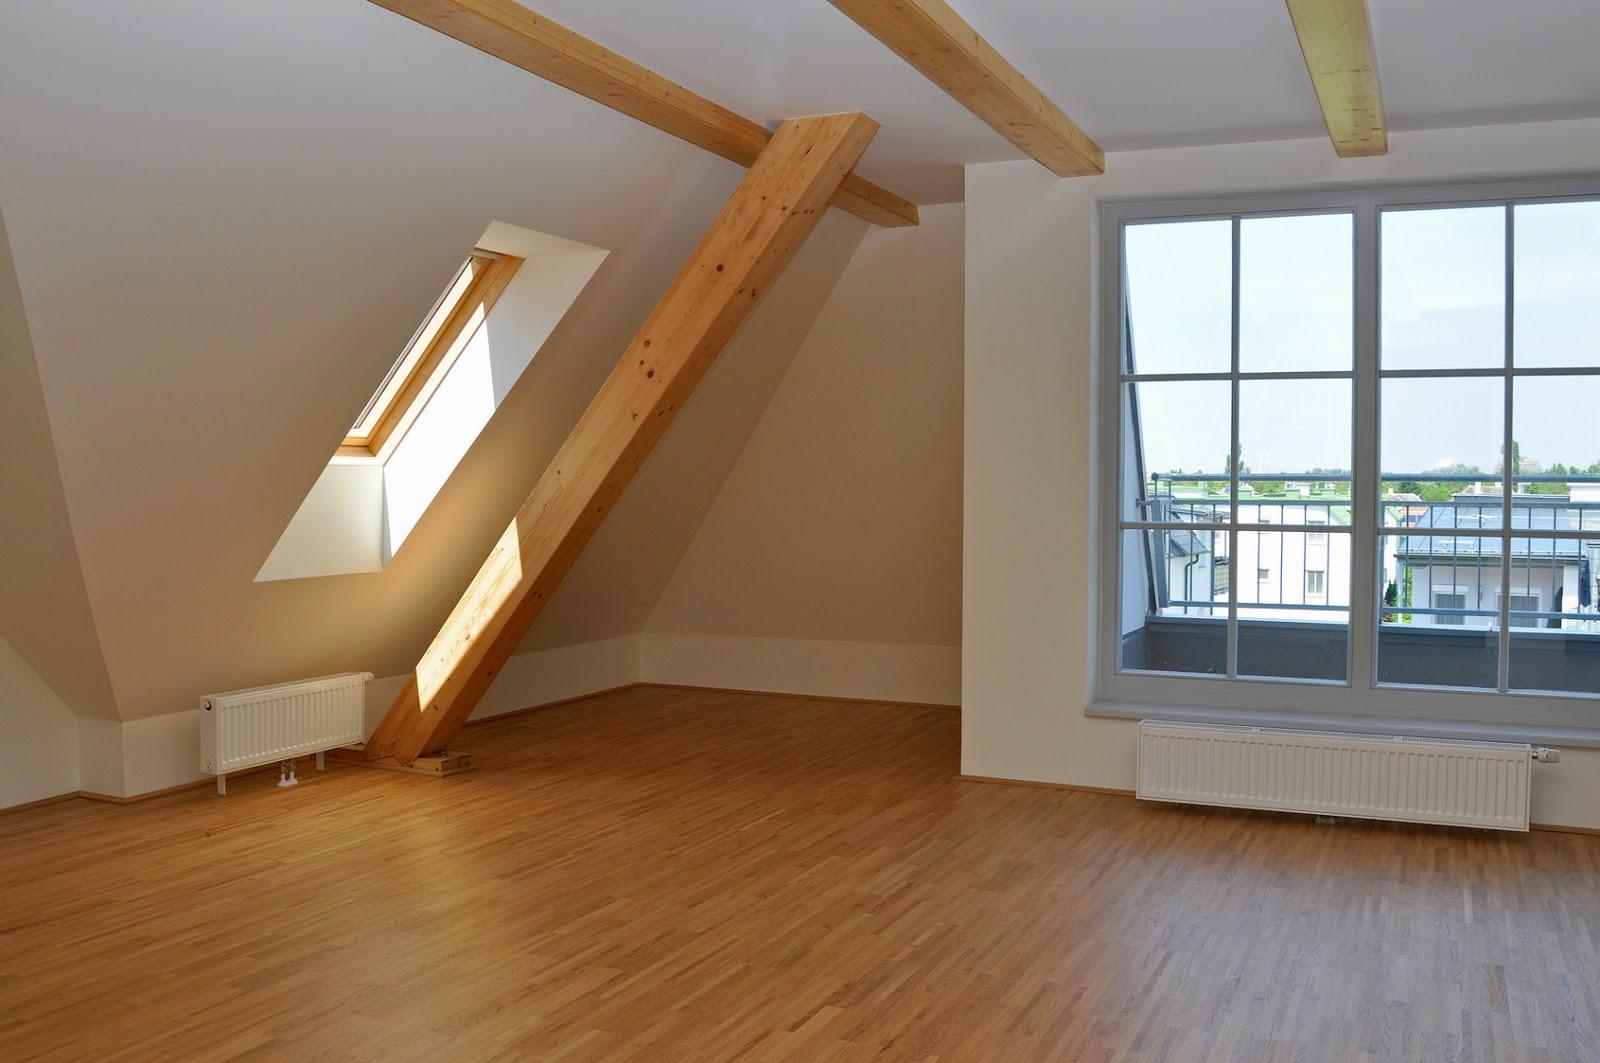 Sanding Rough Wood Floors